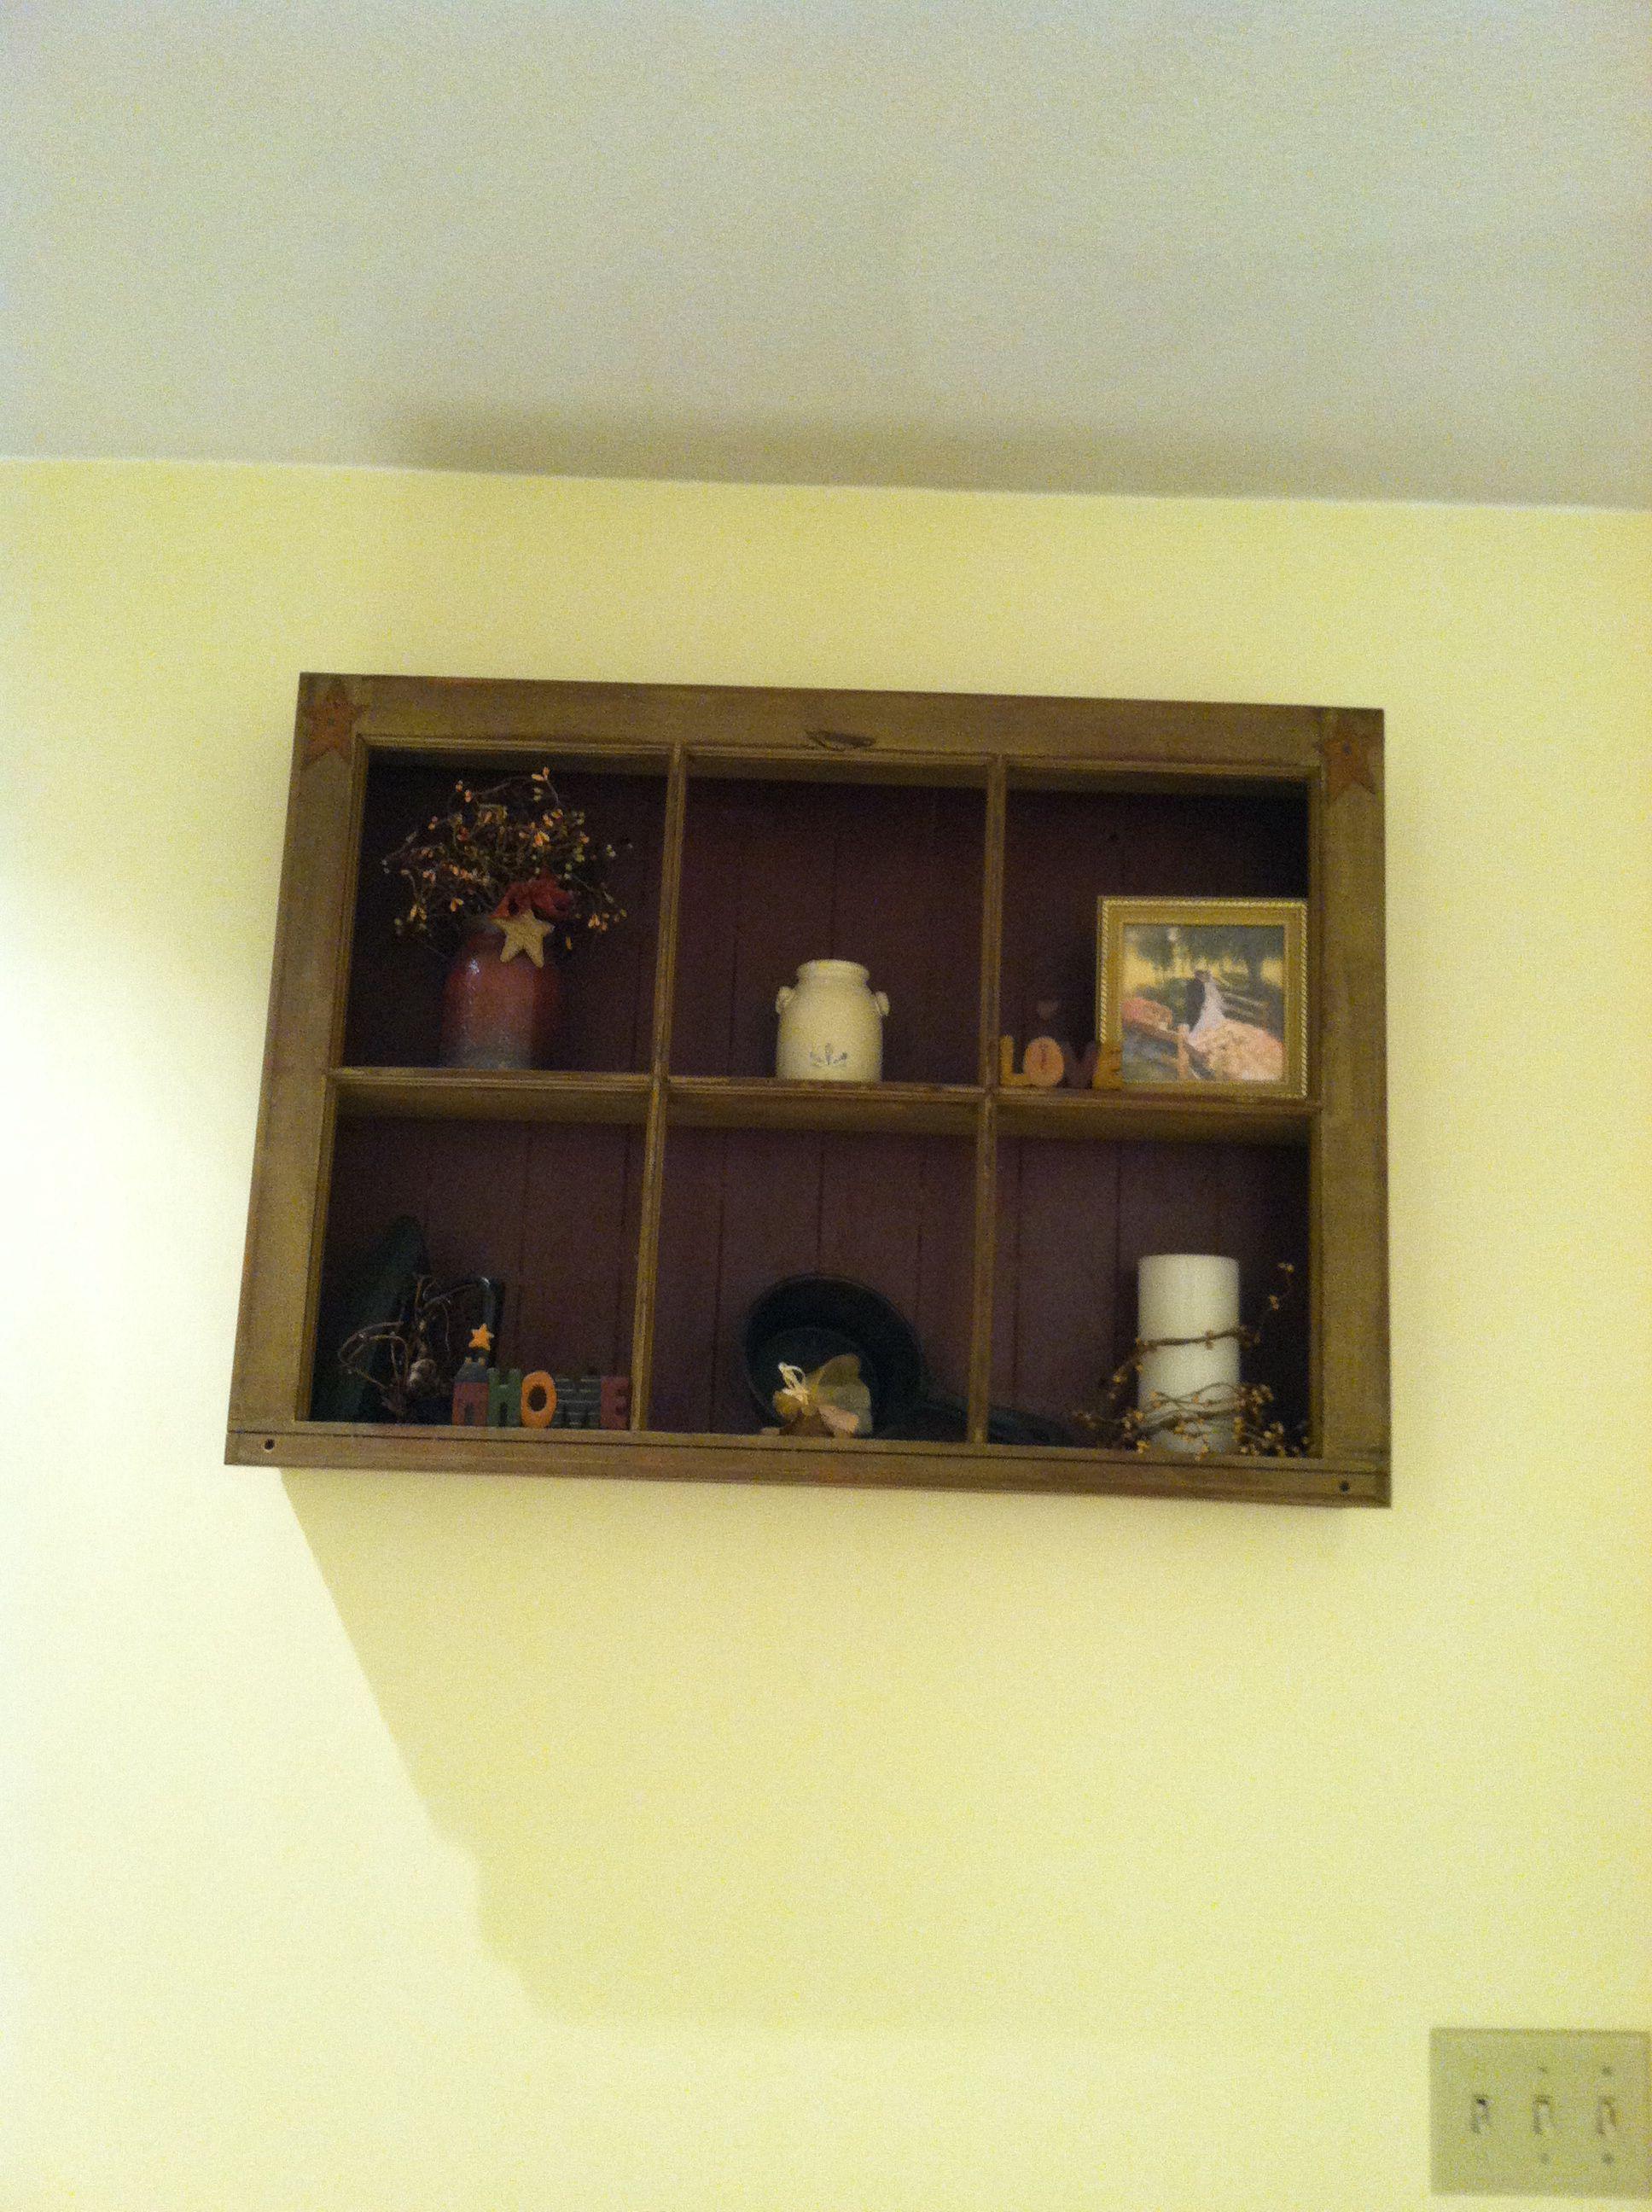 3 pane window ideas  window pane shelf  around the house  pinterest  shelves window